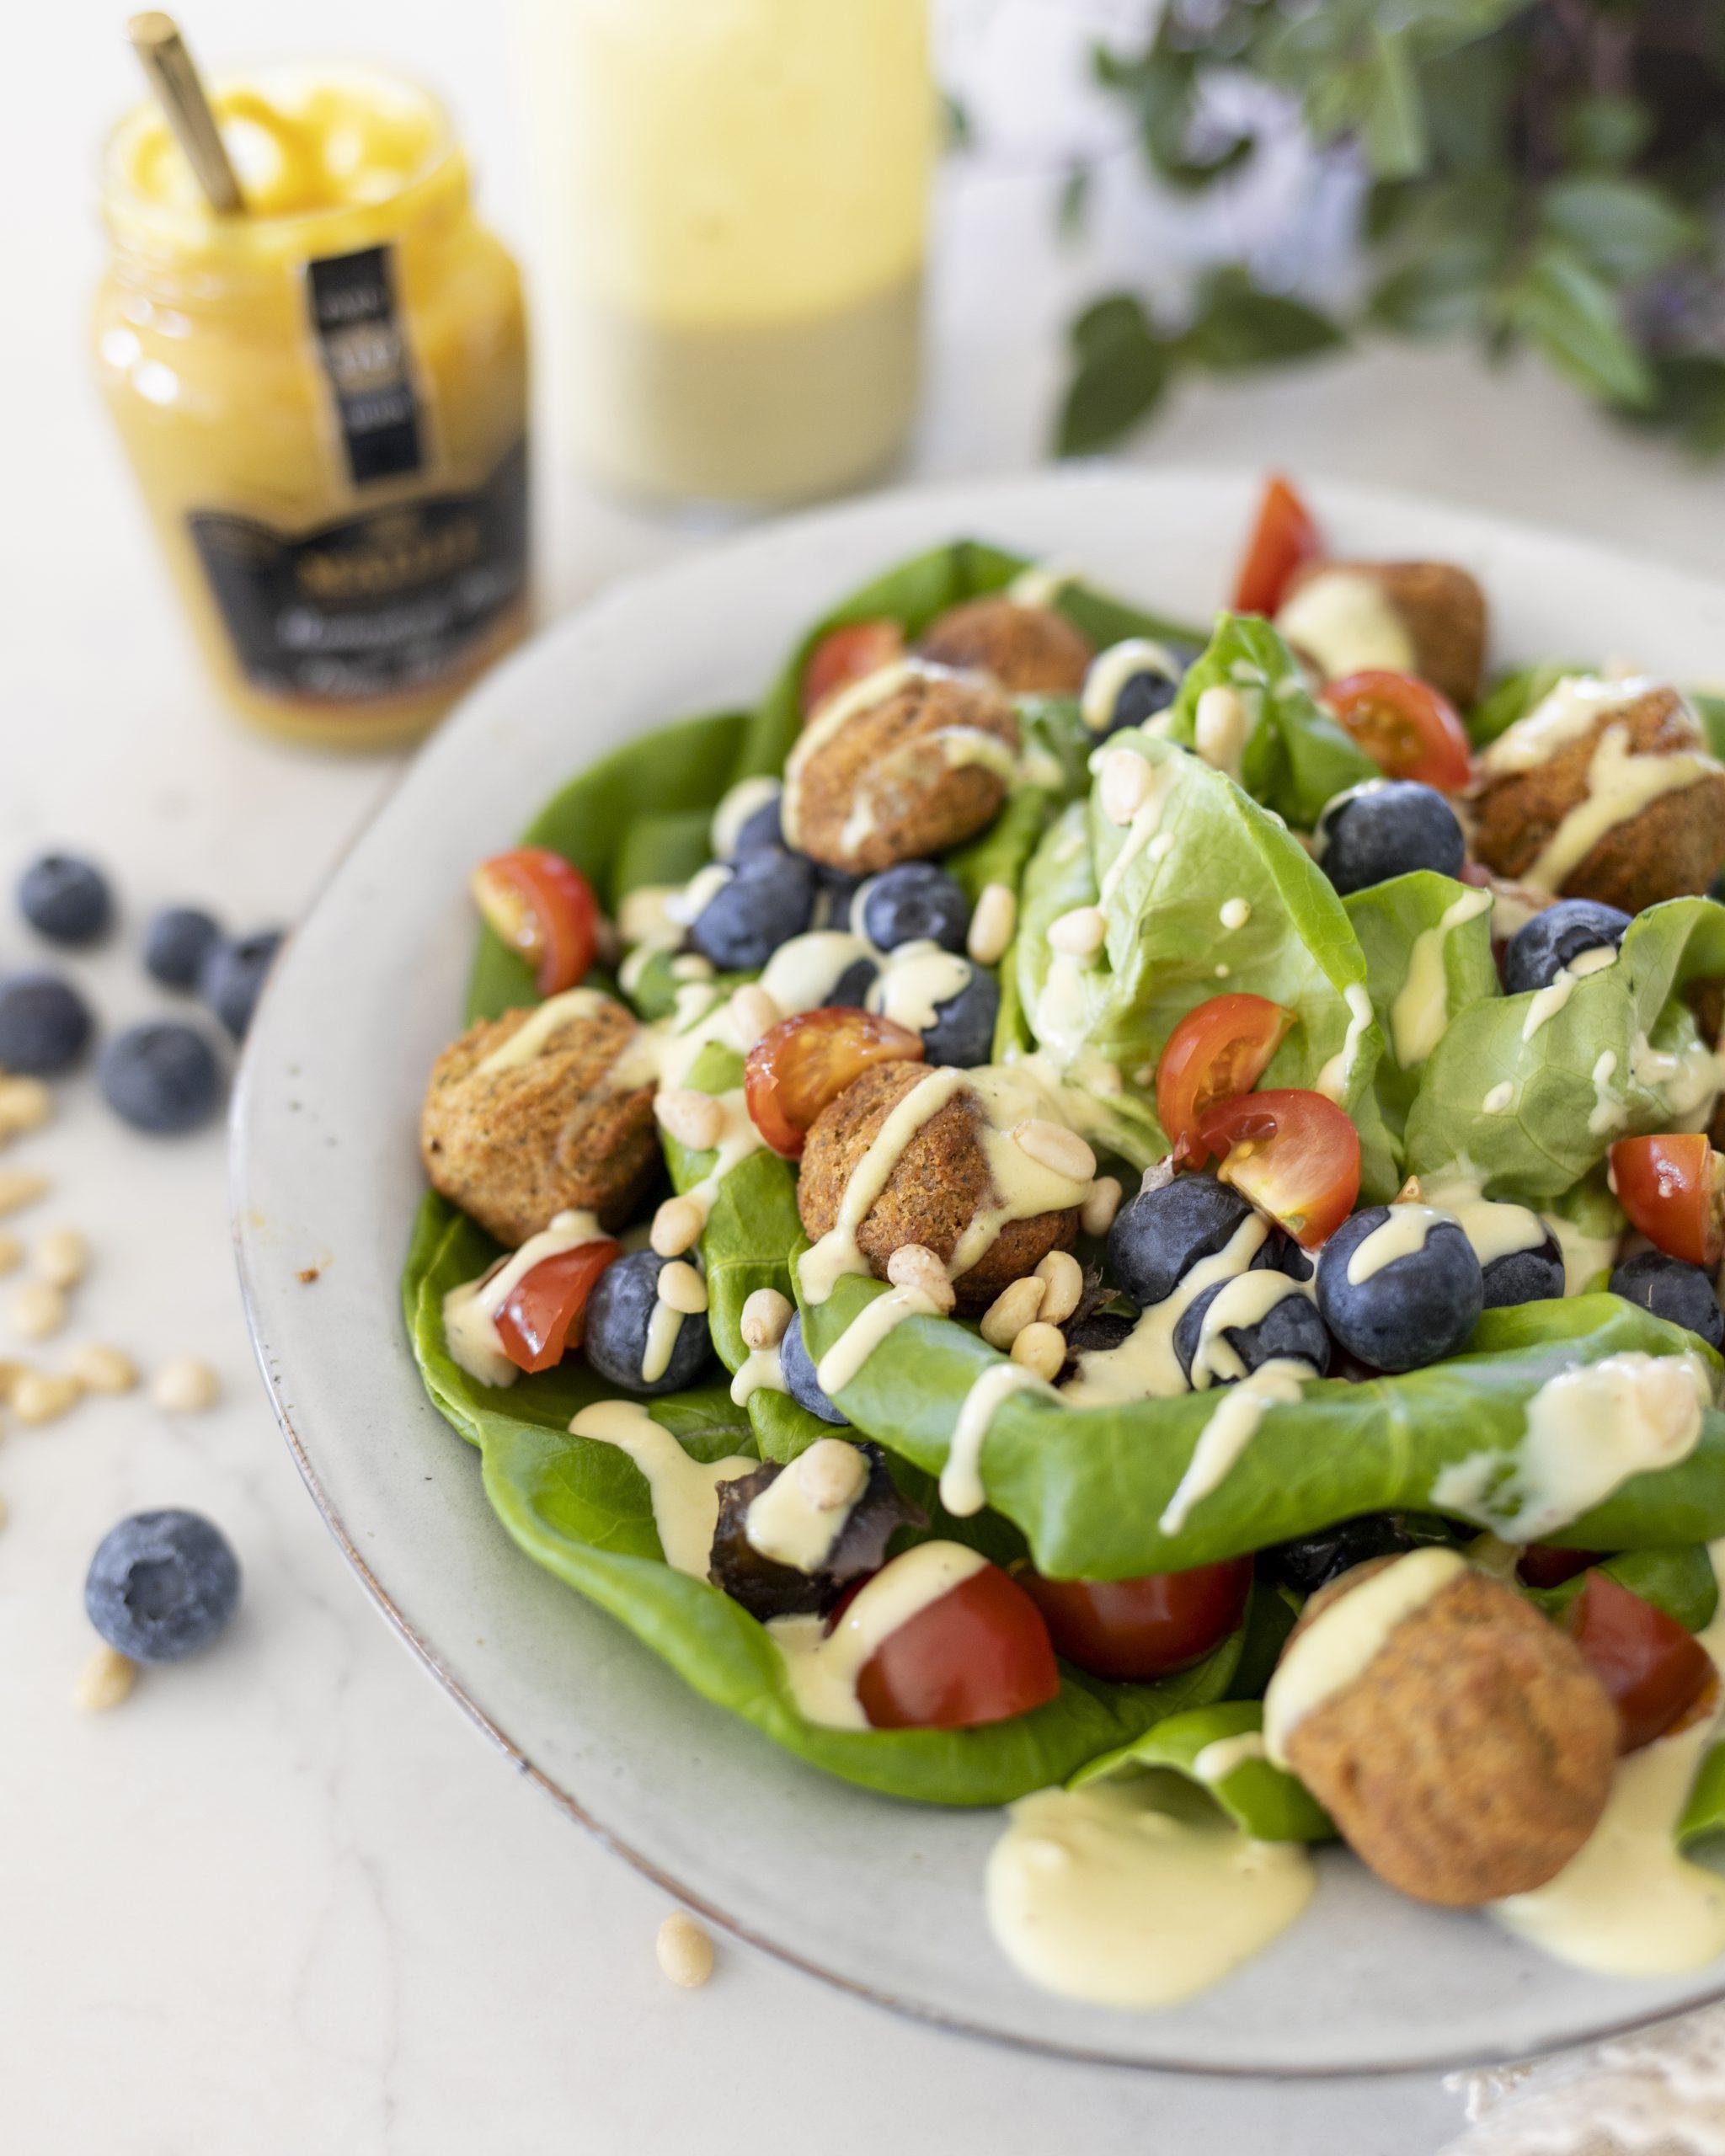 Ferskt falafel salat með Hunangssinneps salatdressingu